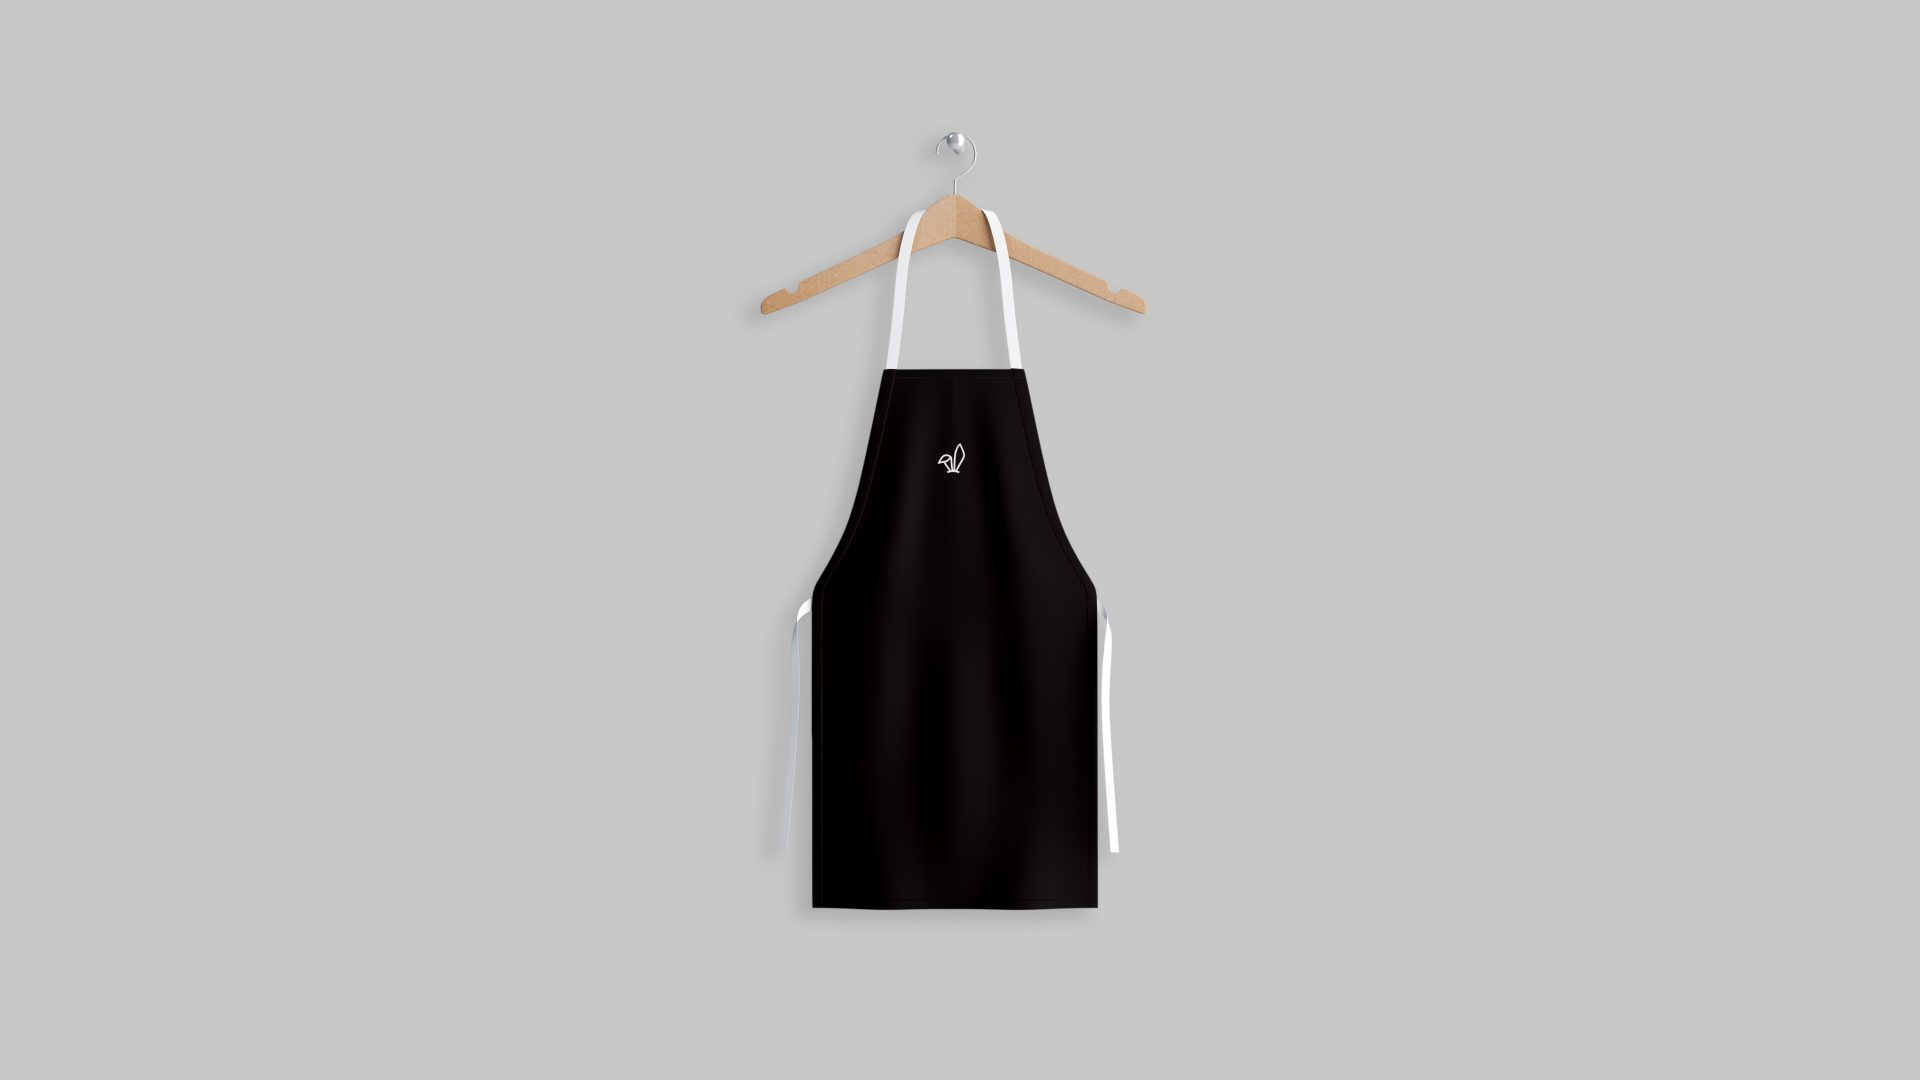 Brand identity design by Crate47. The Bunny bubble tea logo marque in white on a black apron.